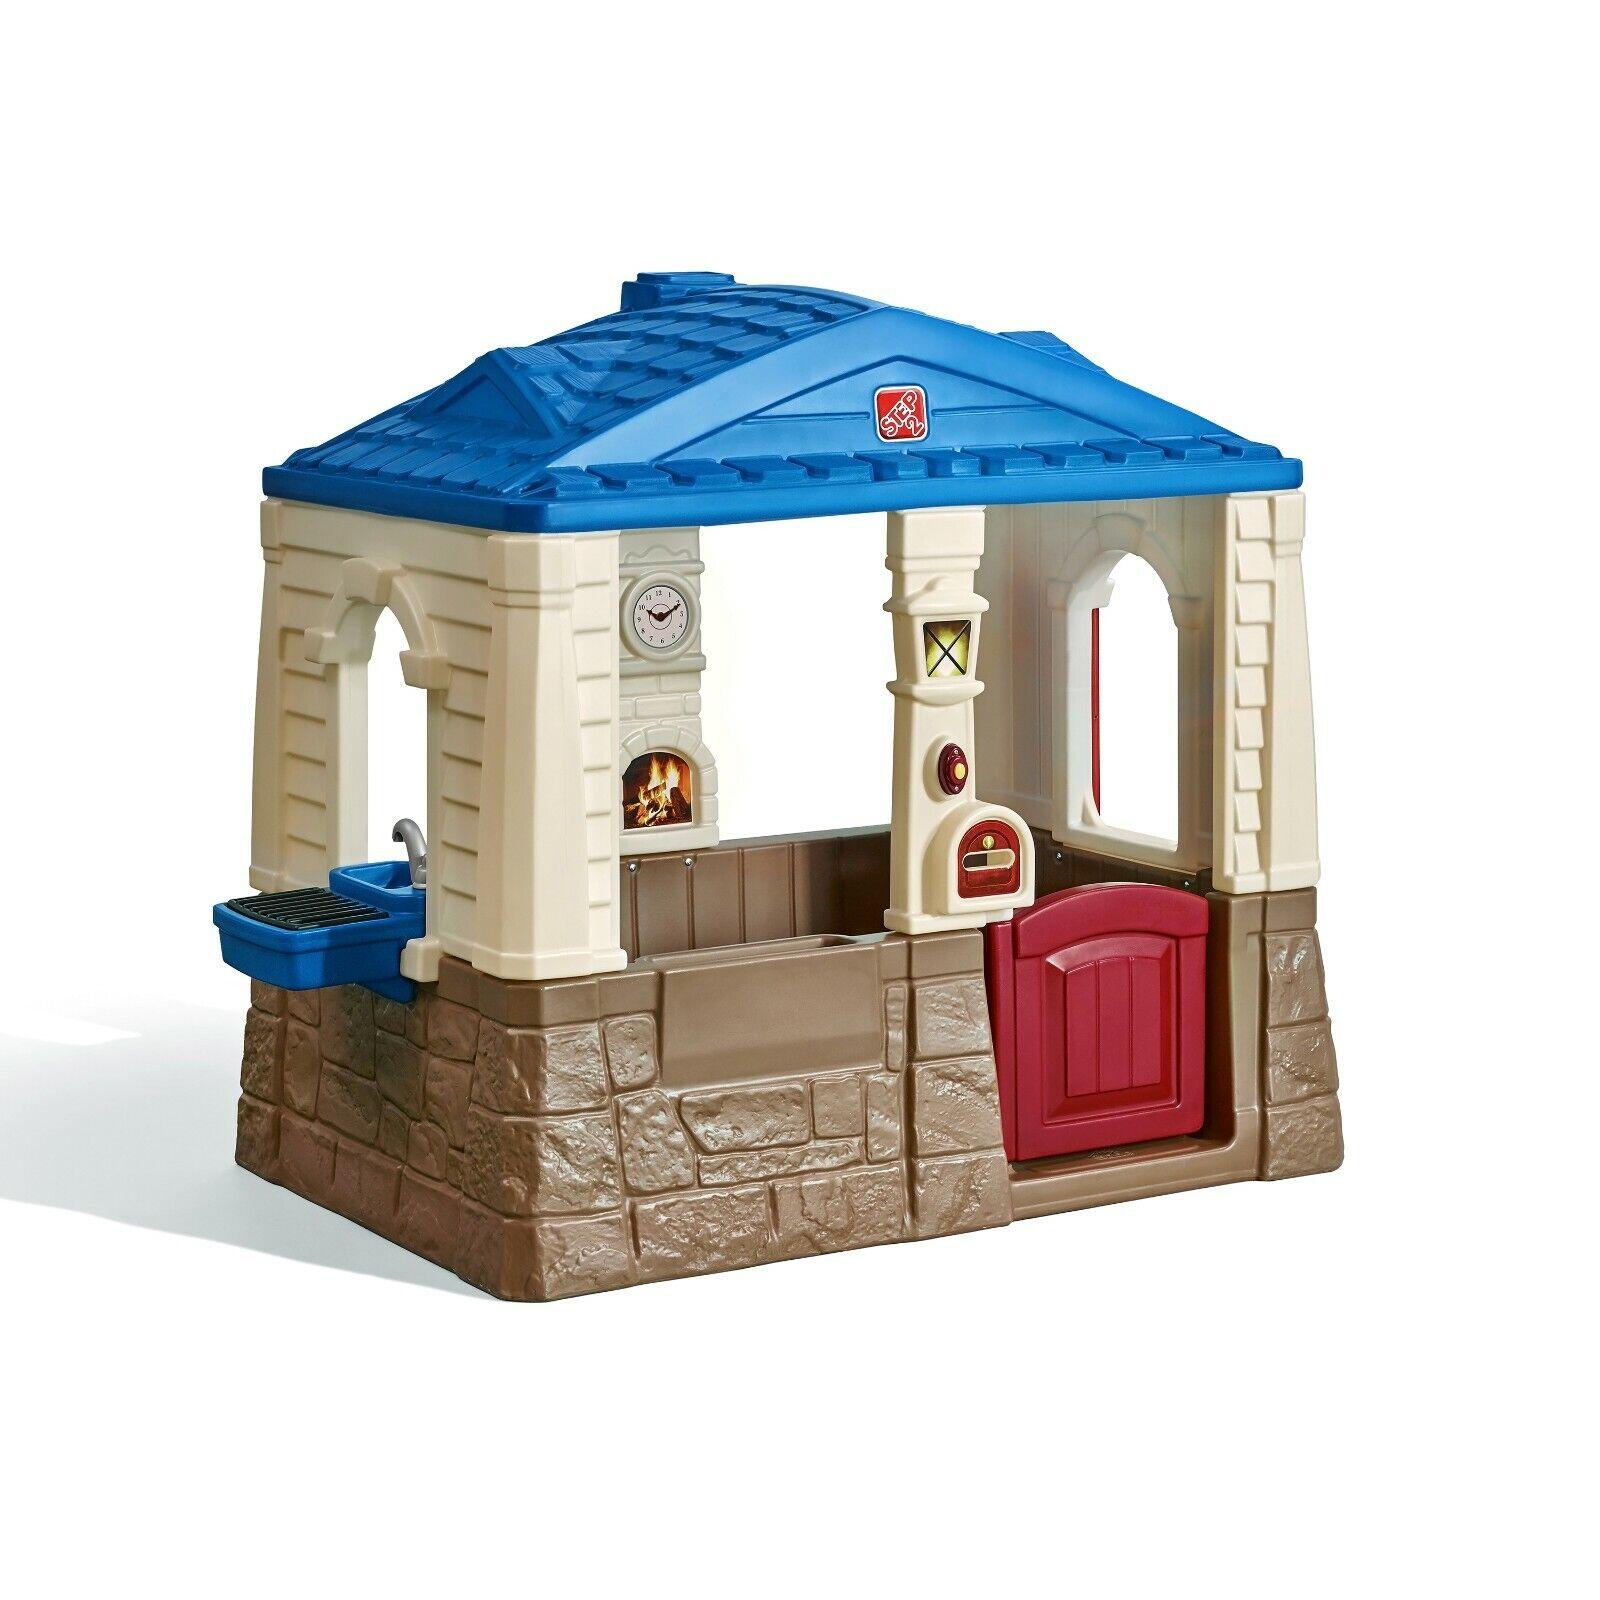 Cottage Playhouse Outdoor Kids Toy Children Plastic Backyard